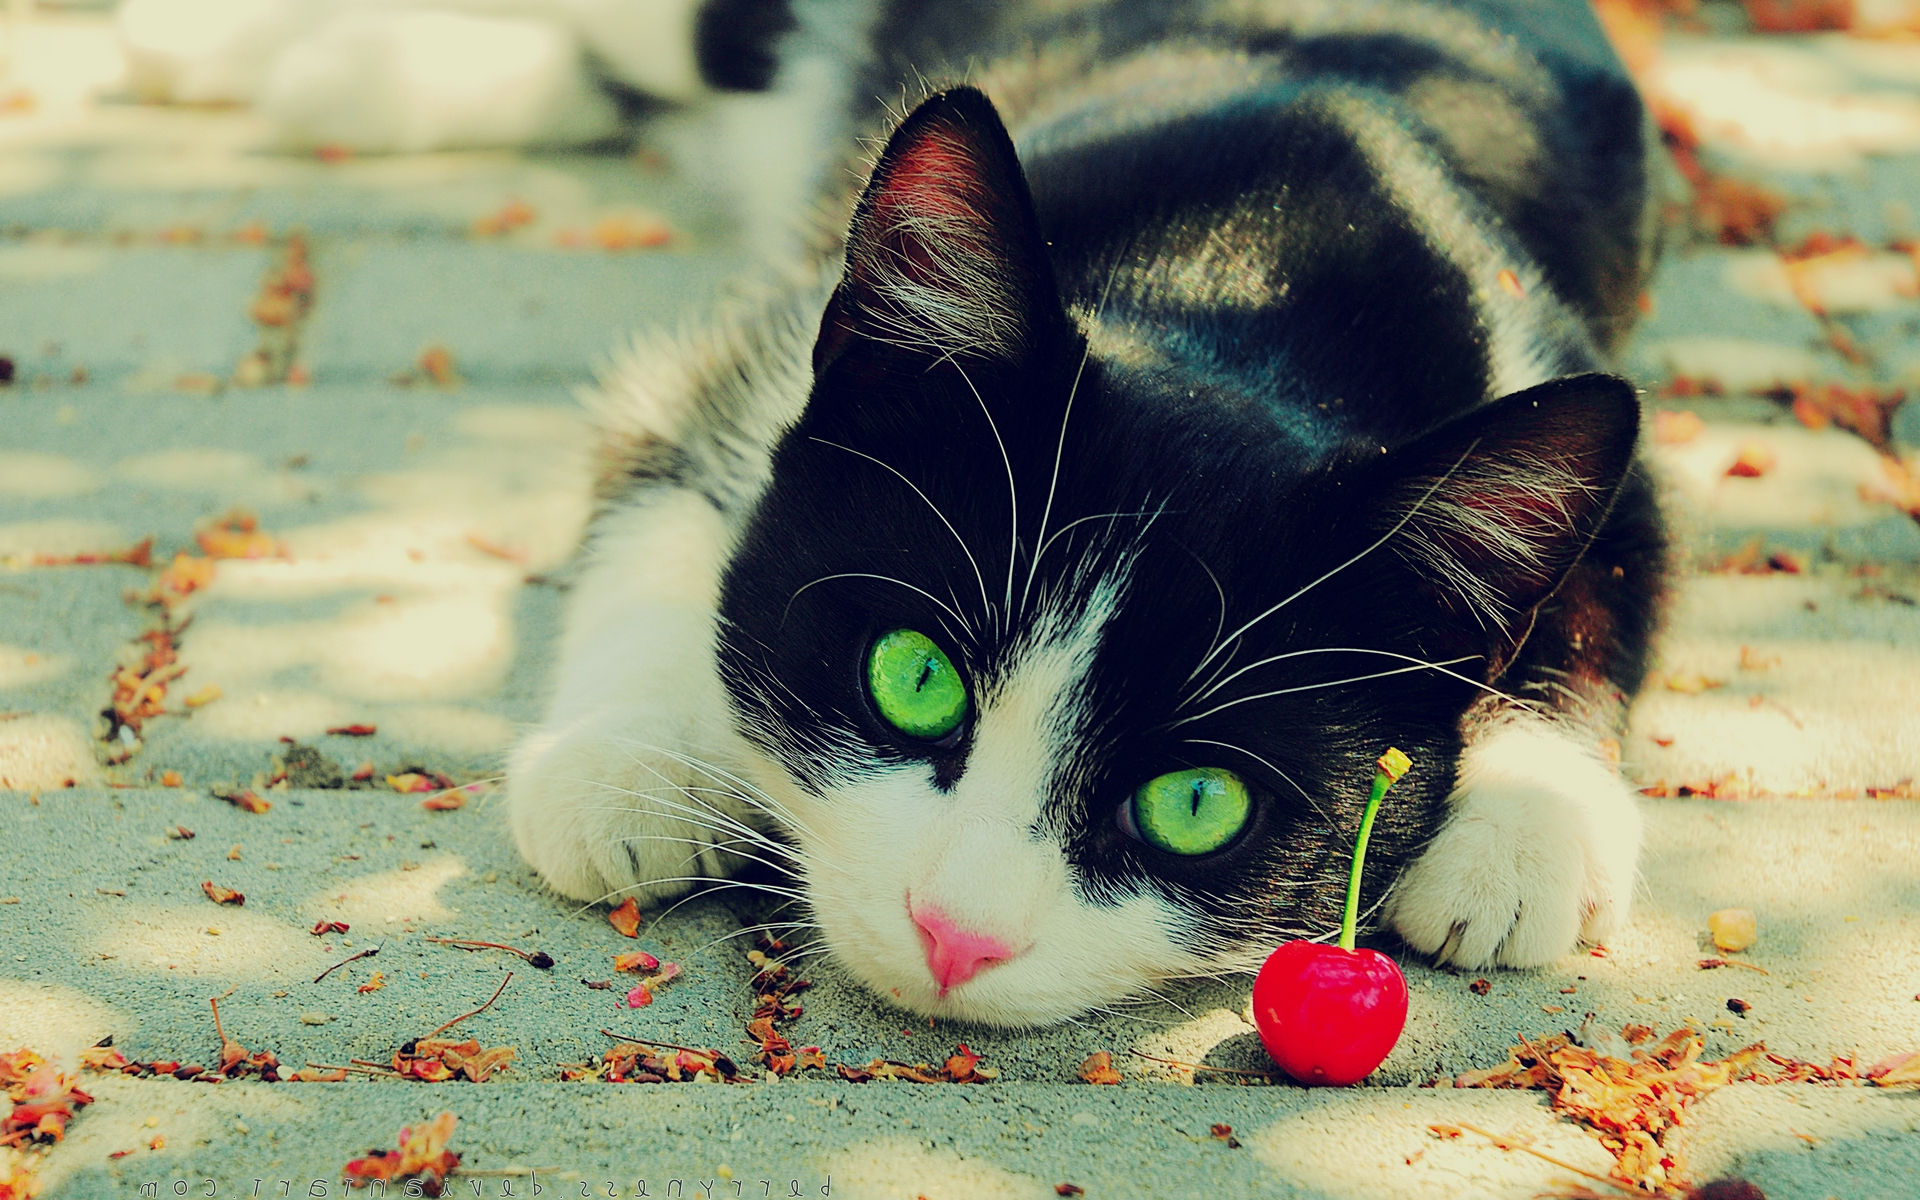 Un gatito curioso - 1920x1200